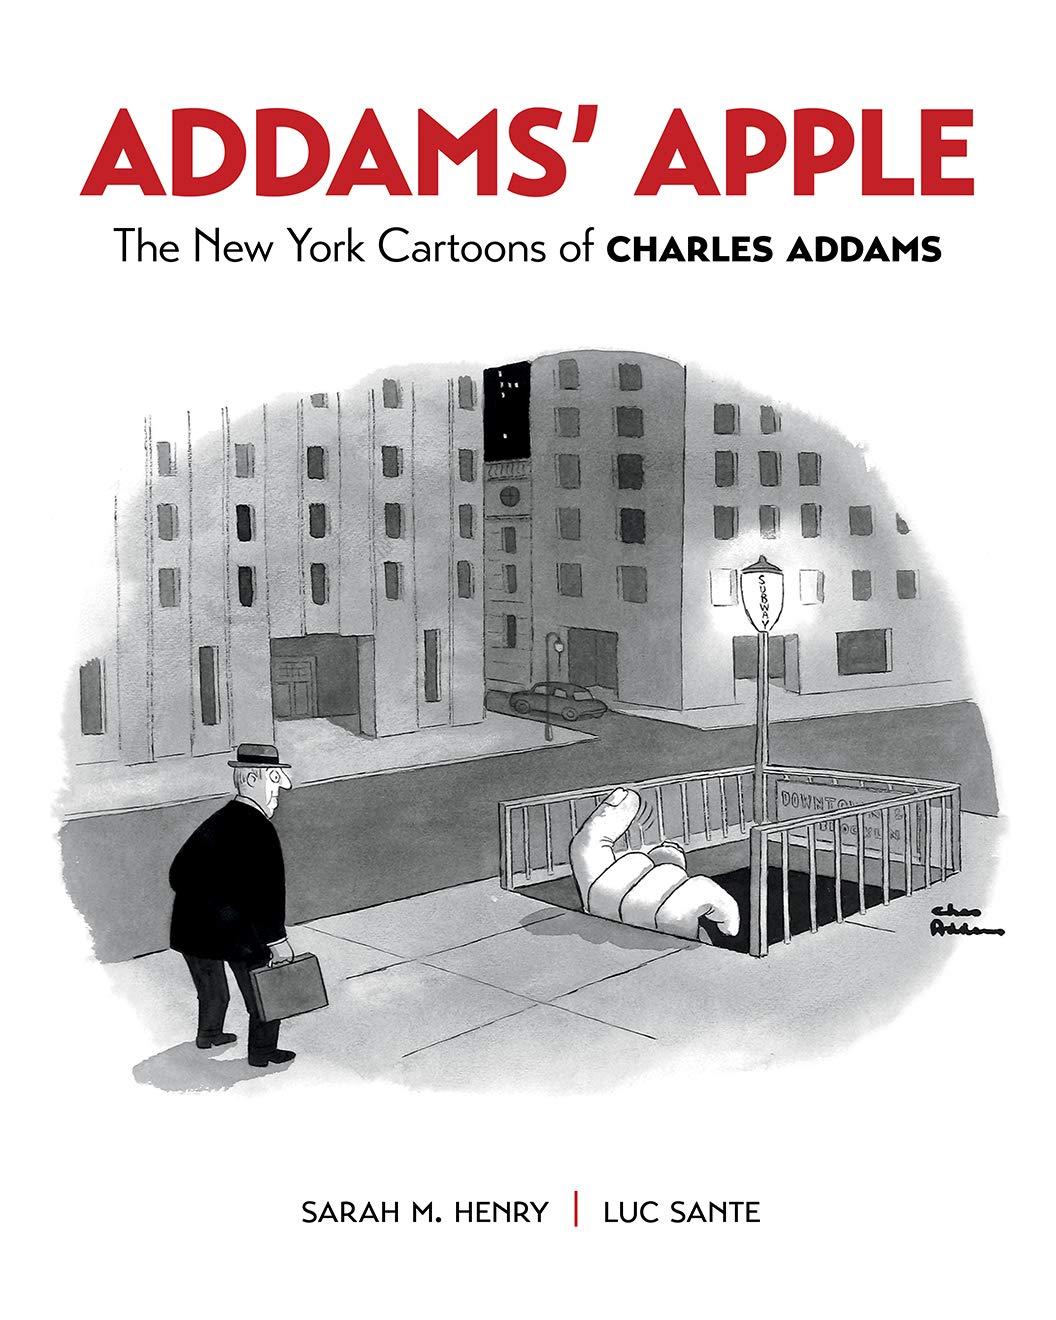 Addams Apple The New York Cartoons Of Charles Addams Sarah M Henry Luc Sante Charles Addams Charles Addams 9780764999369 Amazon Com Books